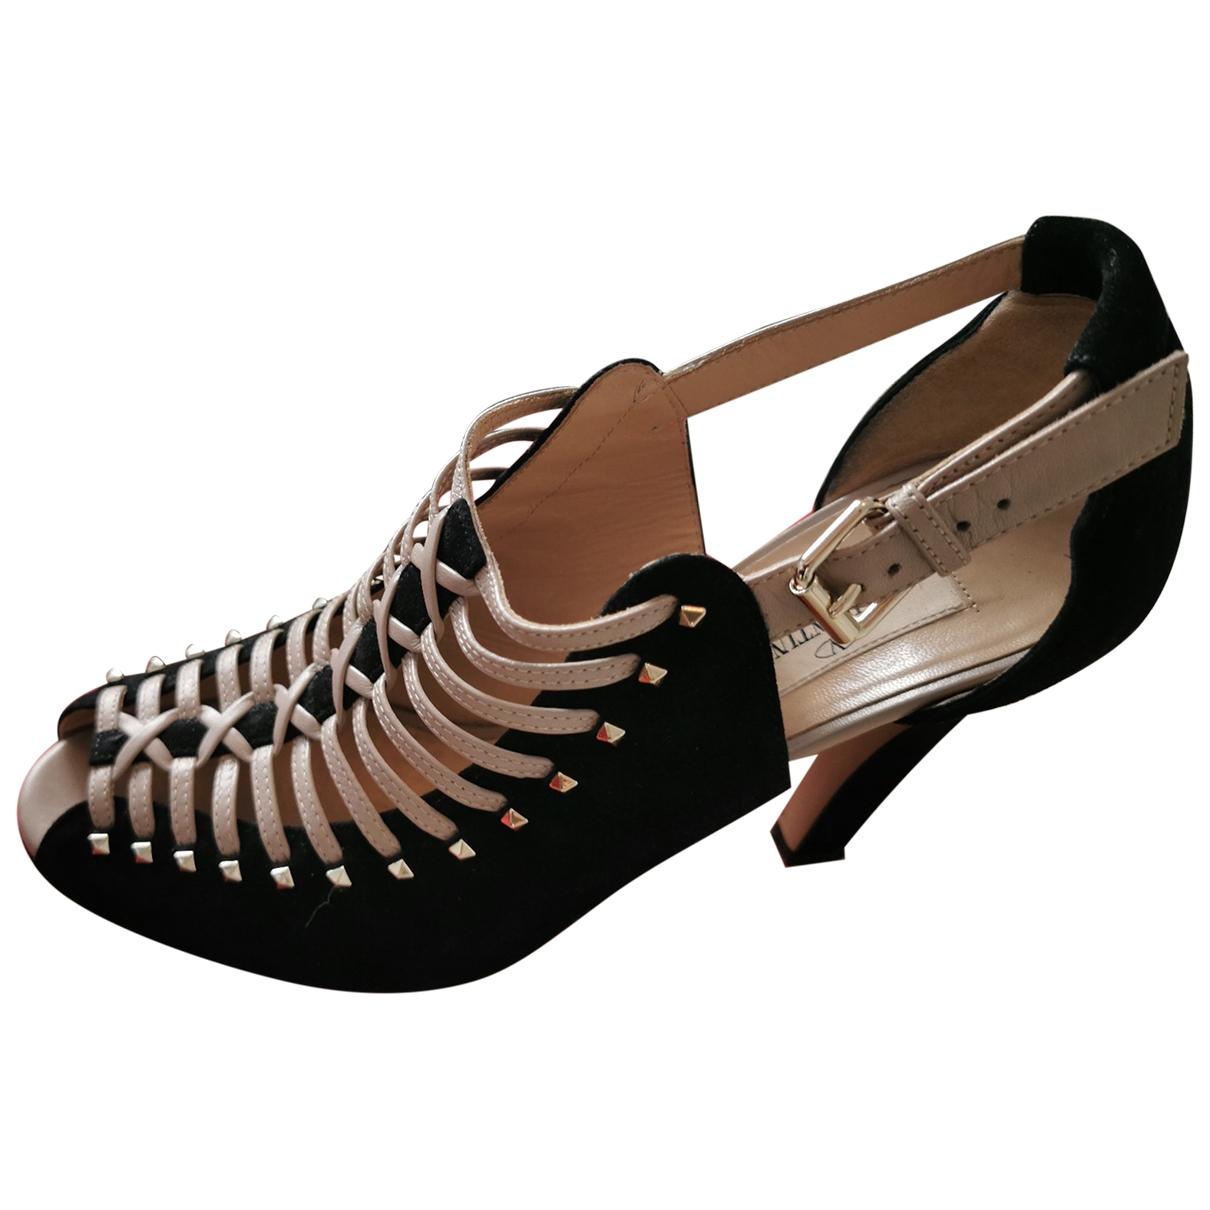 Valentino Garavani \N Black Suede Sandals for Women 38 EU